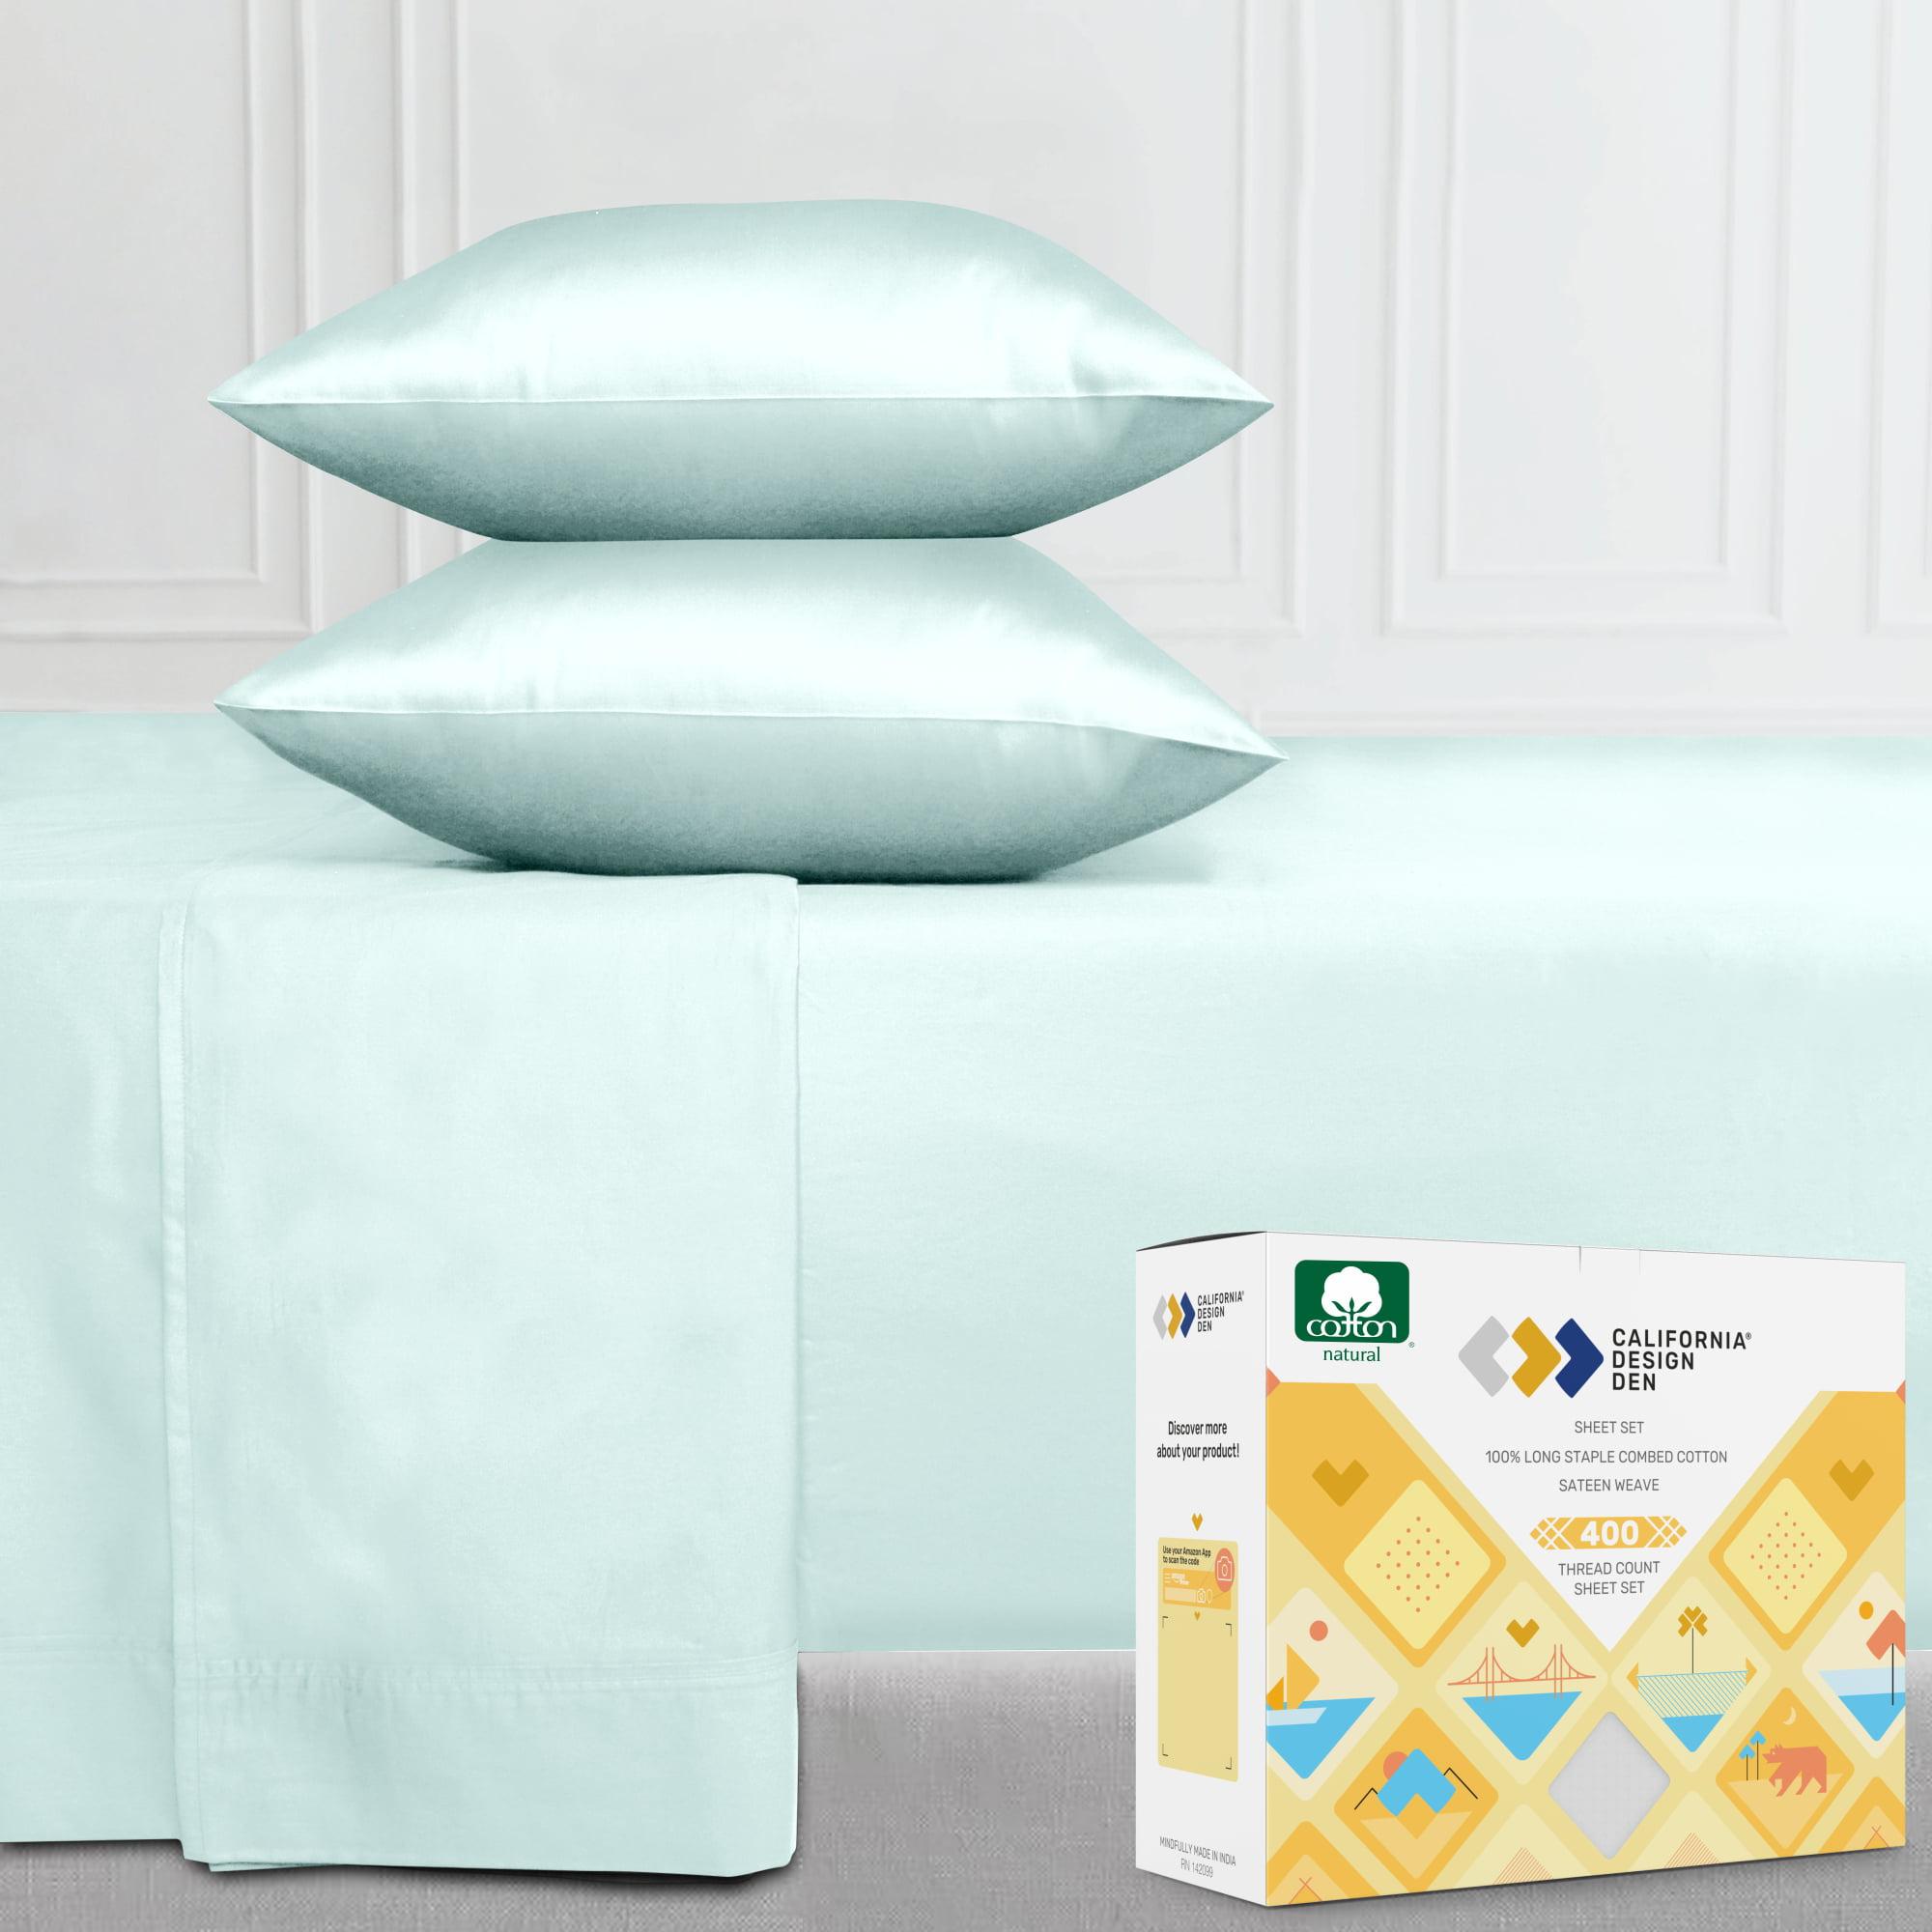 Pure White King California Design Den 400 Thread Count 100/% Cotton Pillowcases